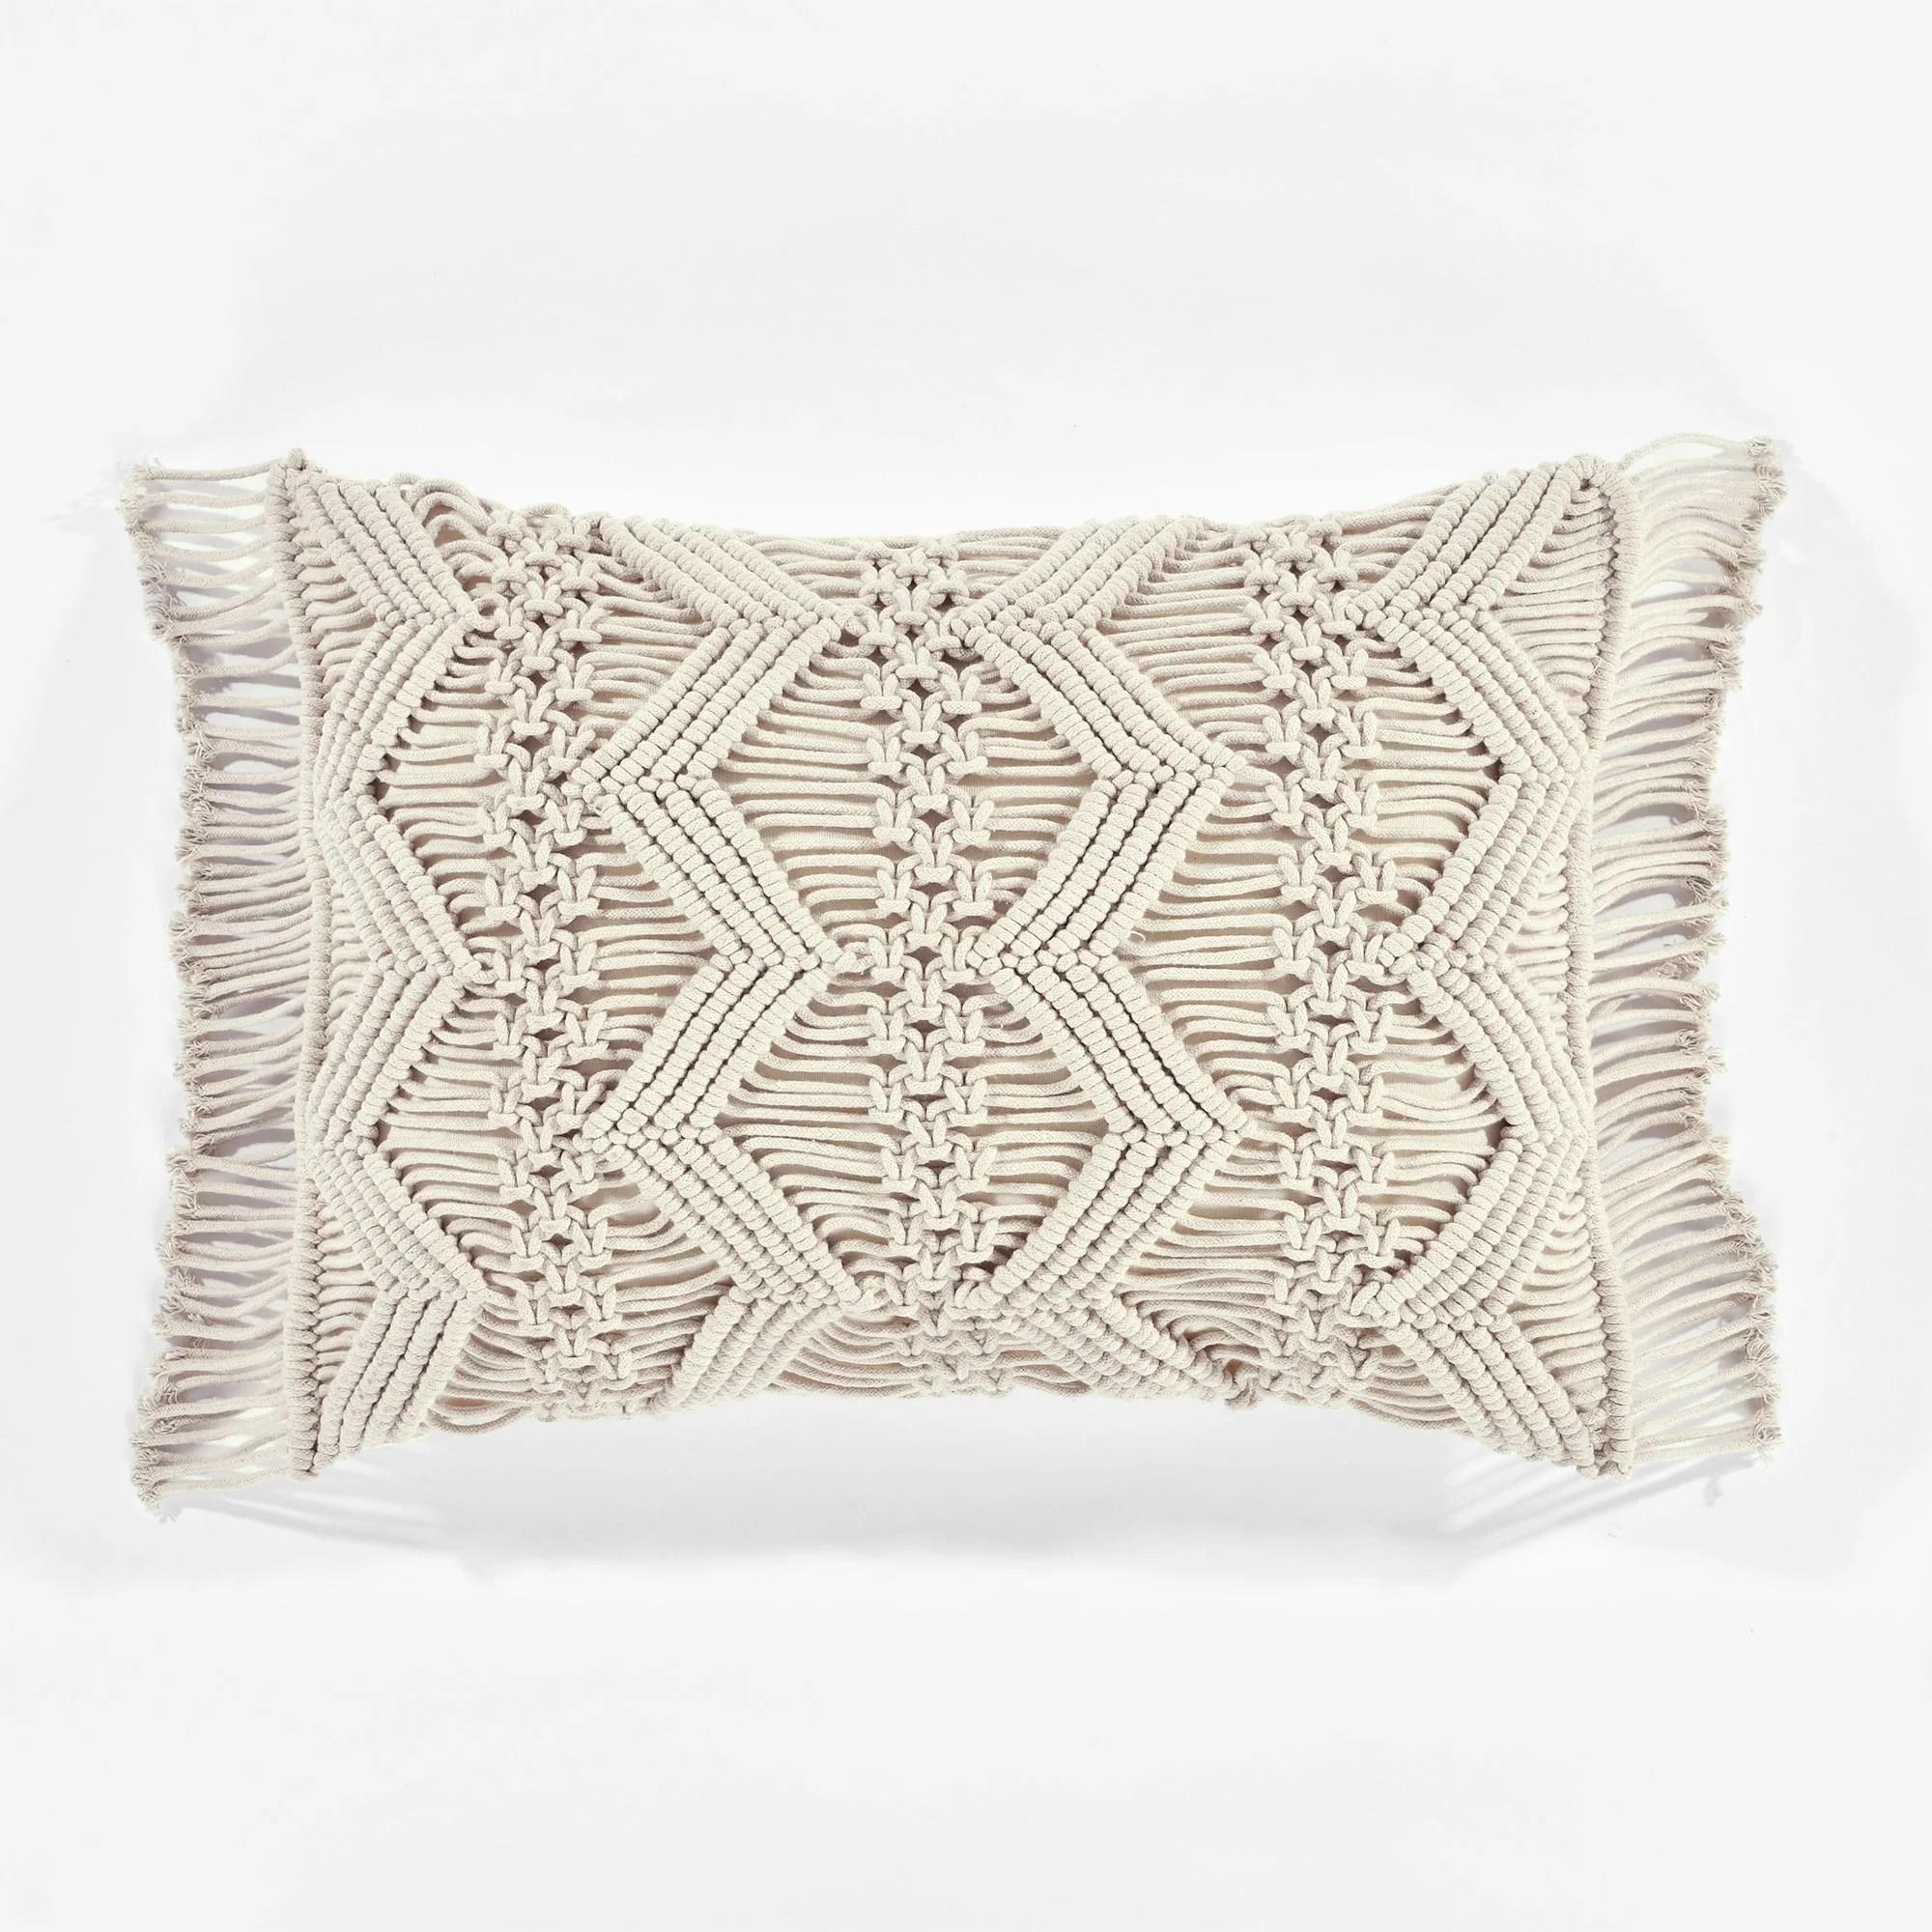 studio chevron macrame decorative pillow cover 13 x 20 3 neutral